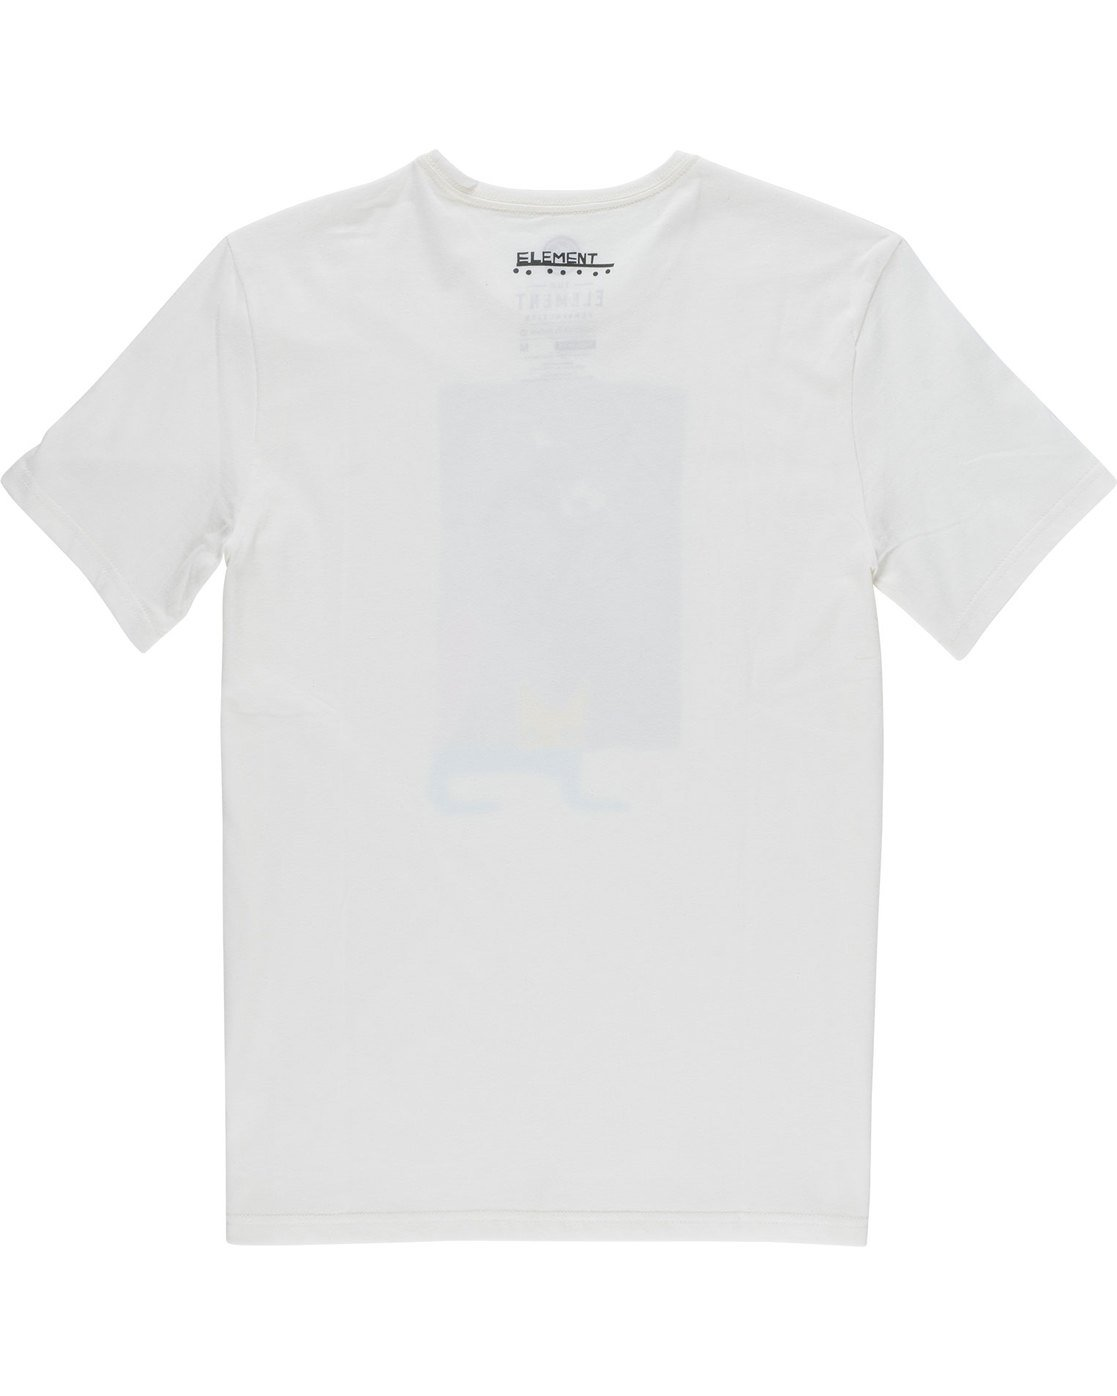 3 Jaakko Cat Ss - Tee Shirt for Men White N1SSF6ELP9 Element